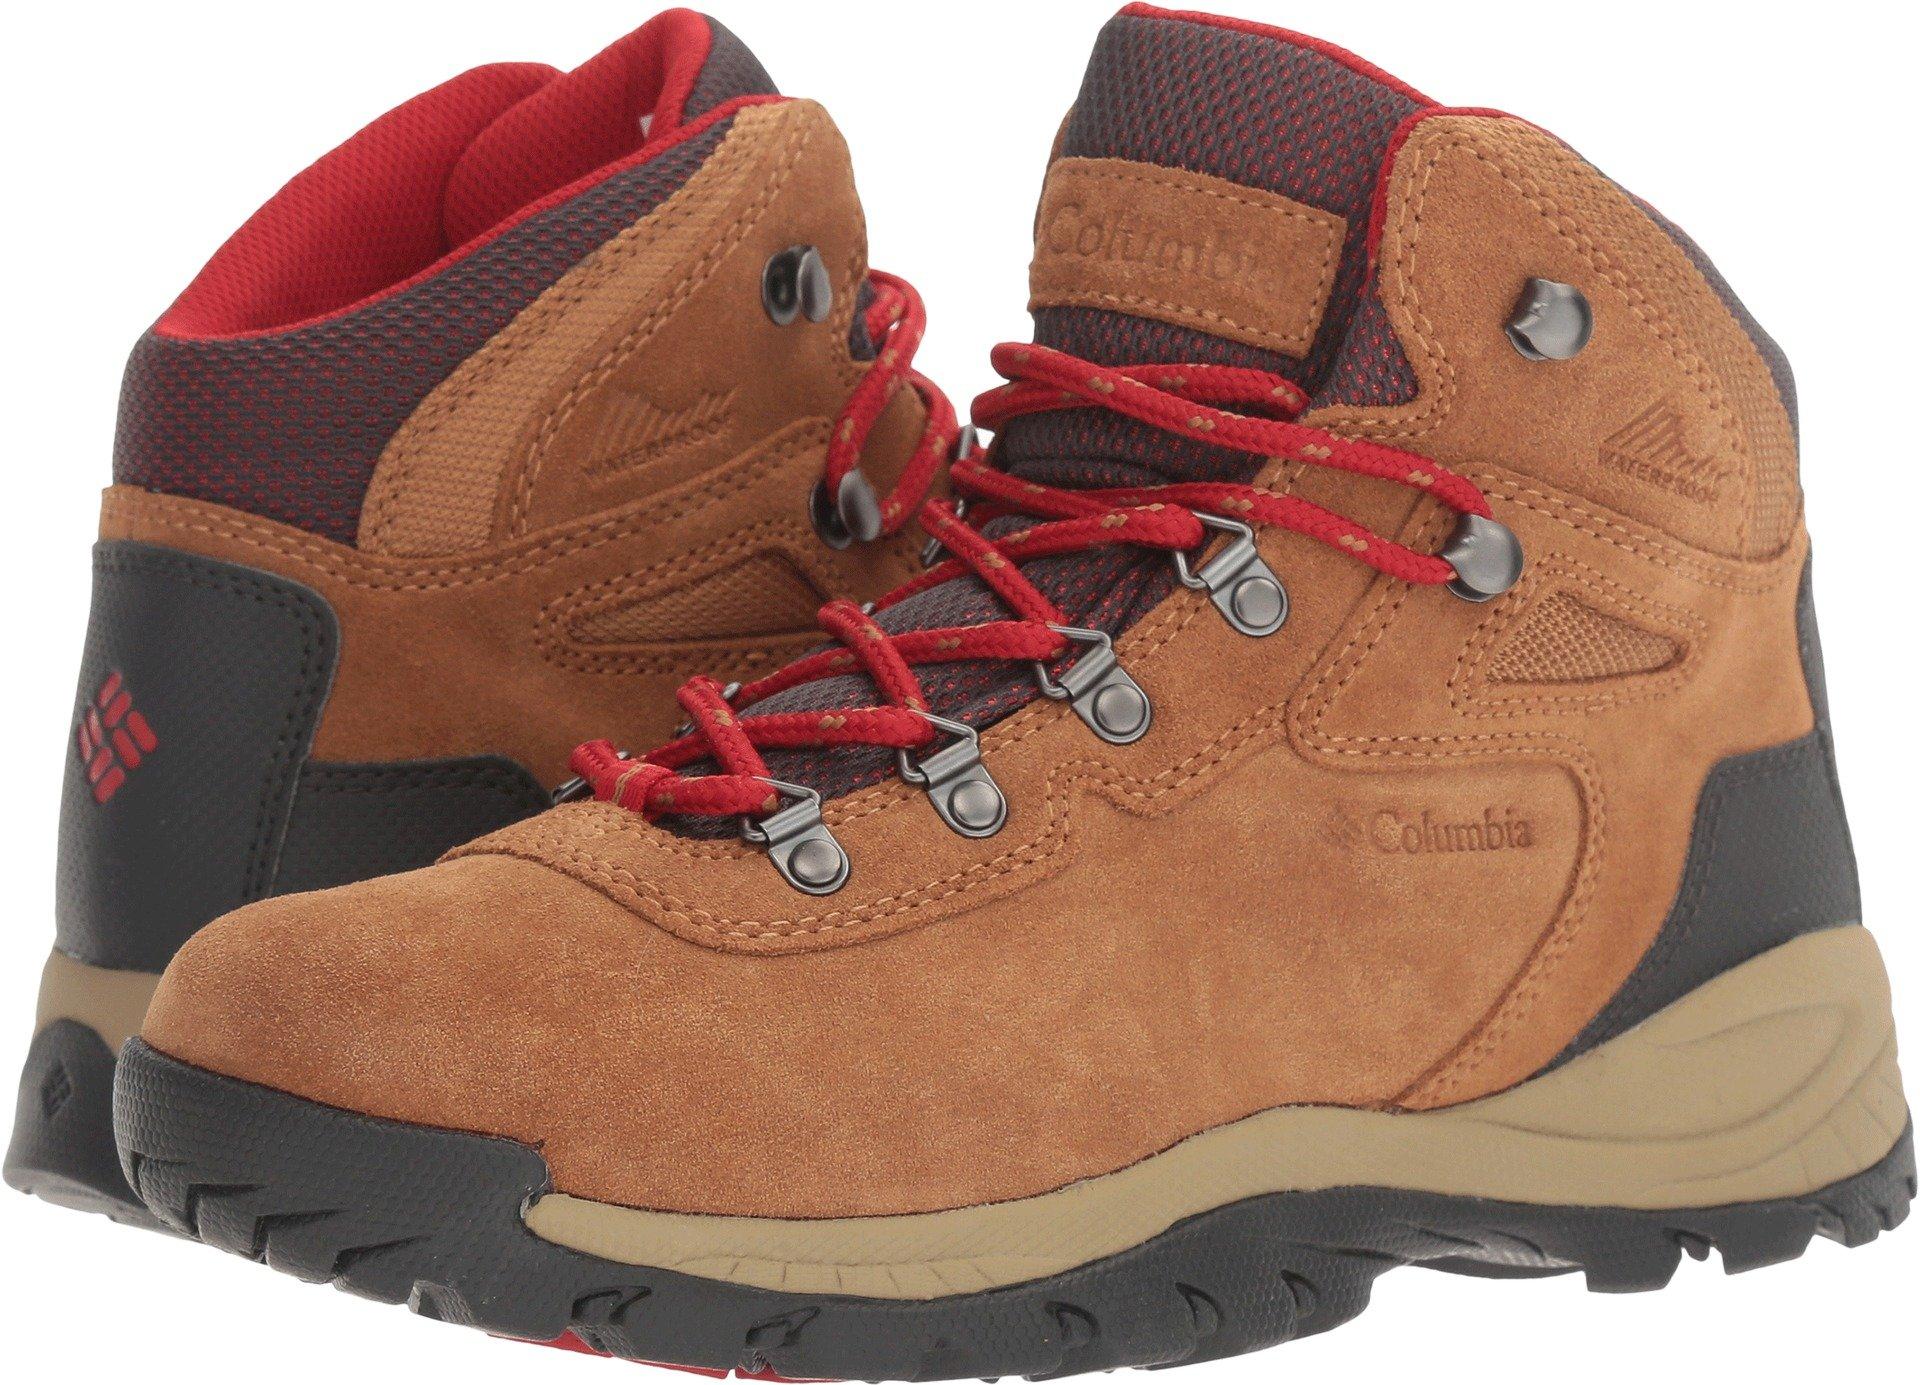 32267725238 Columbia Women's Newton Ridge Plus Waterproof Amped Hiking Boot,  Elk/Mountain Red, 12 Regular US